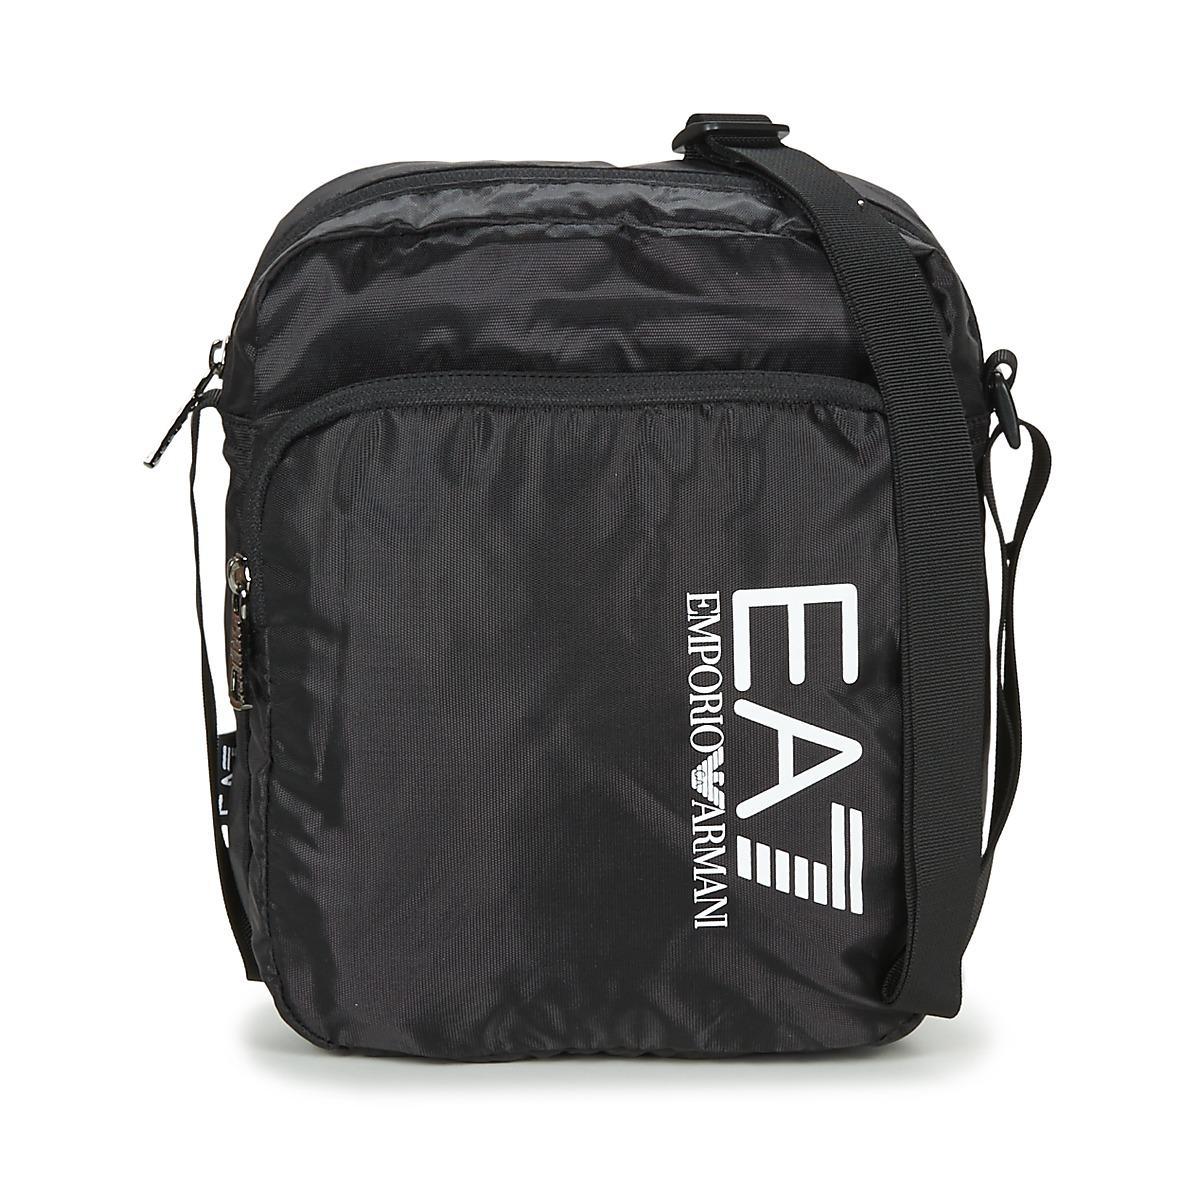 f37908cc7b8b EA7 Train Prime U Pouch Bag Large B Men s Pouch In Black in Black ...